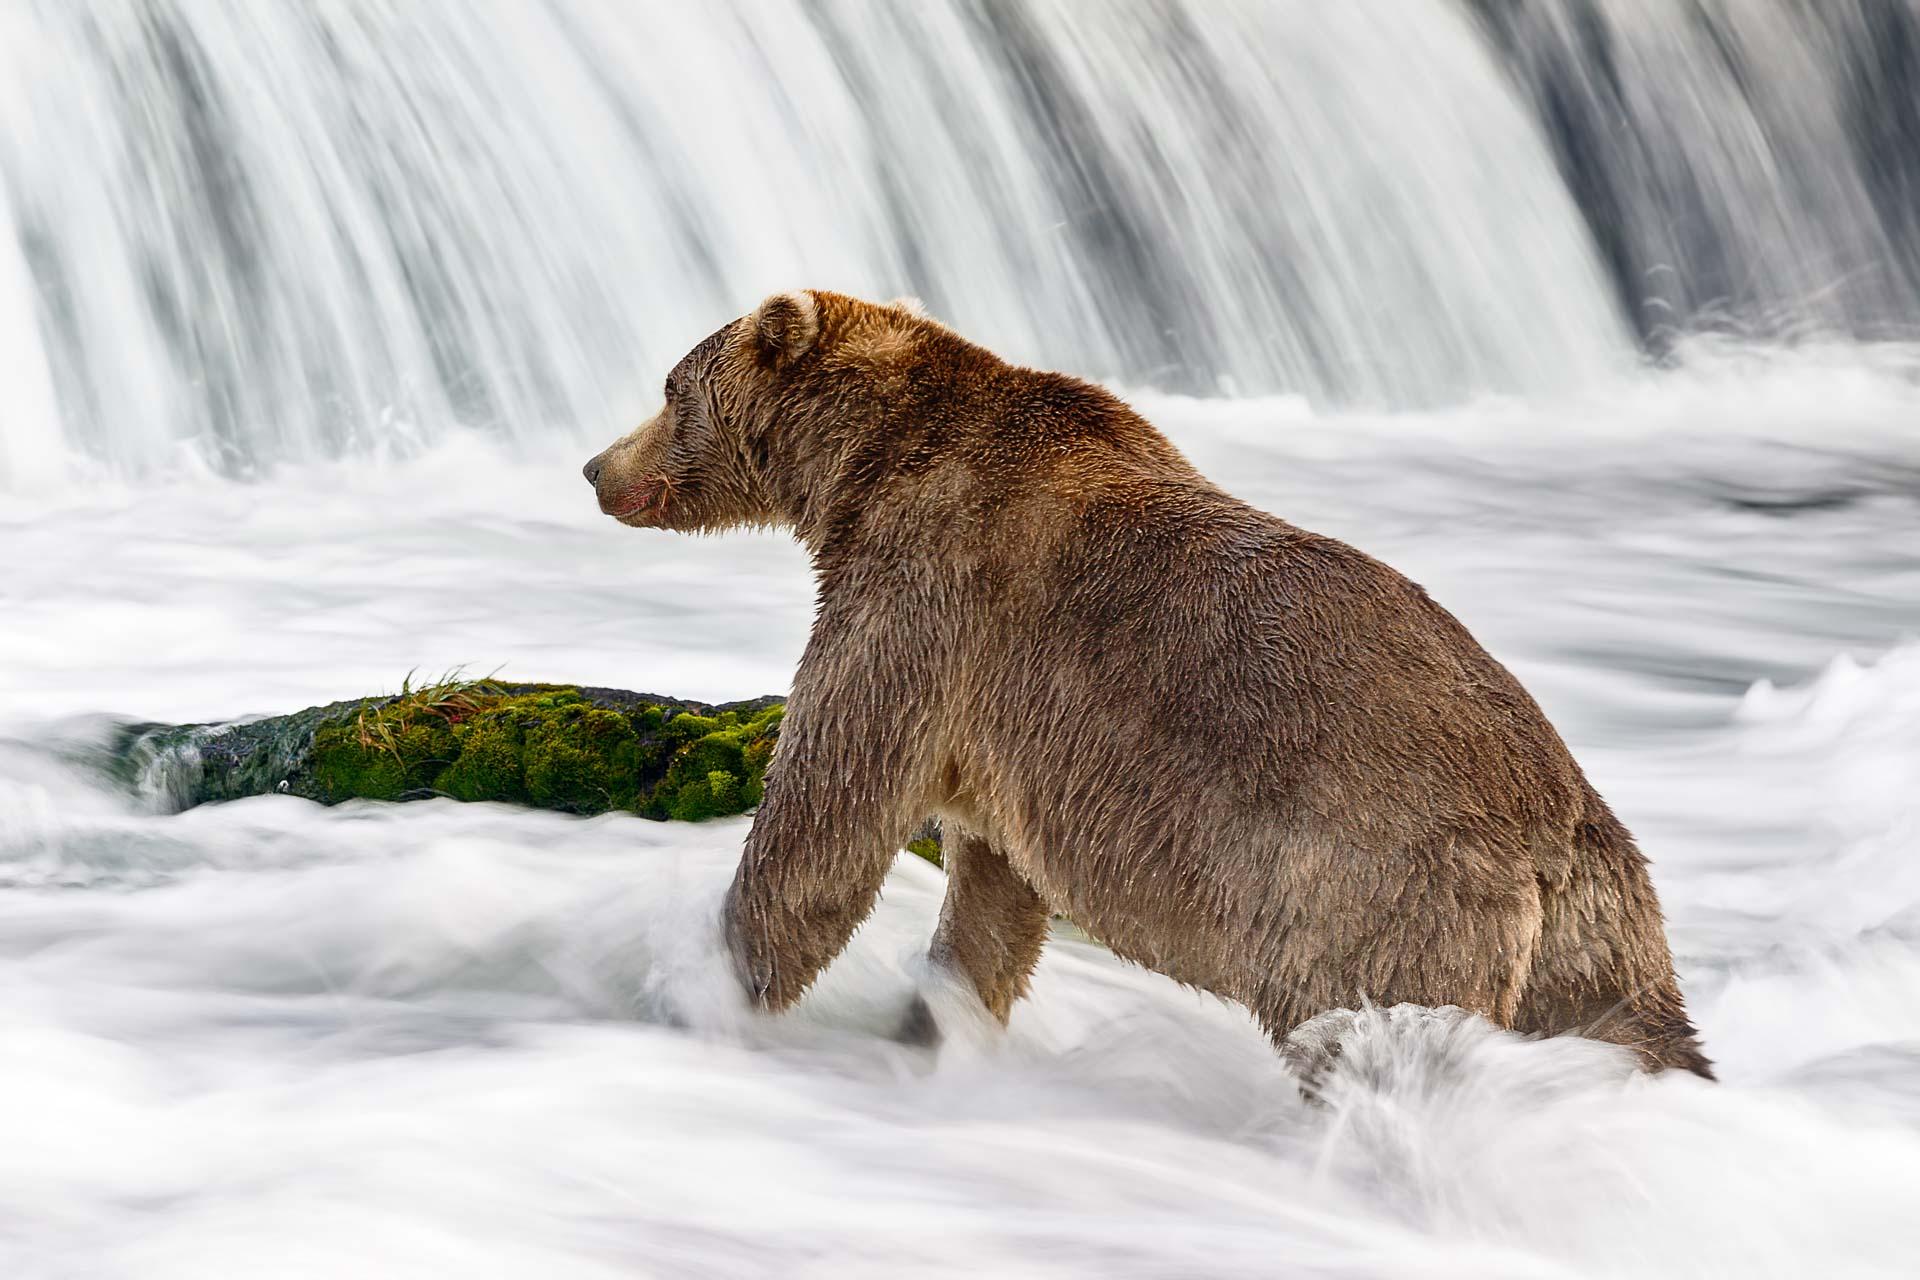 Alaskan Brown Bear by Tim Plowden